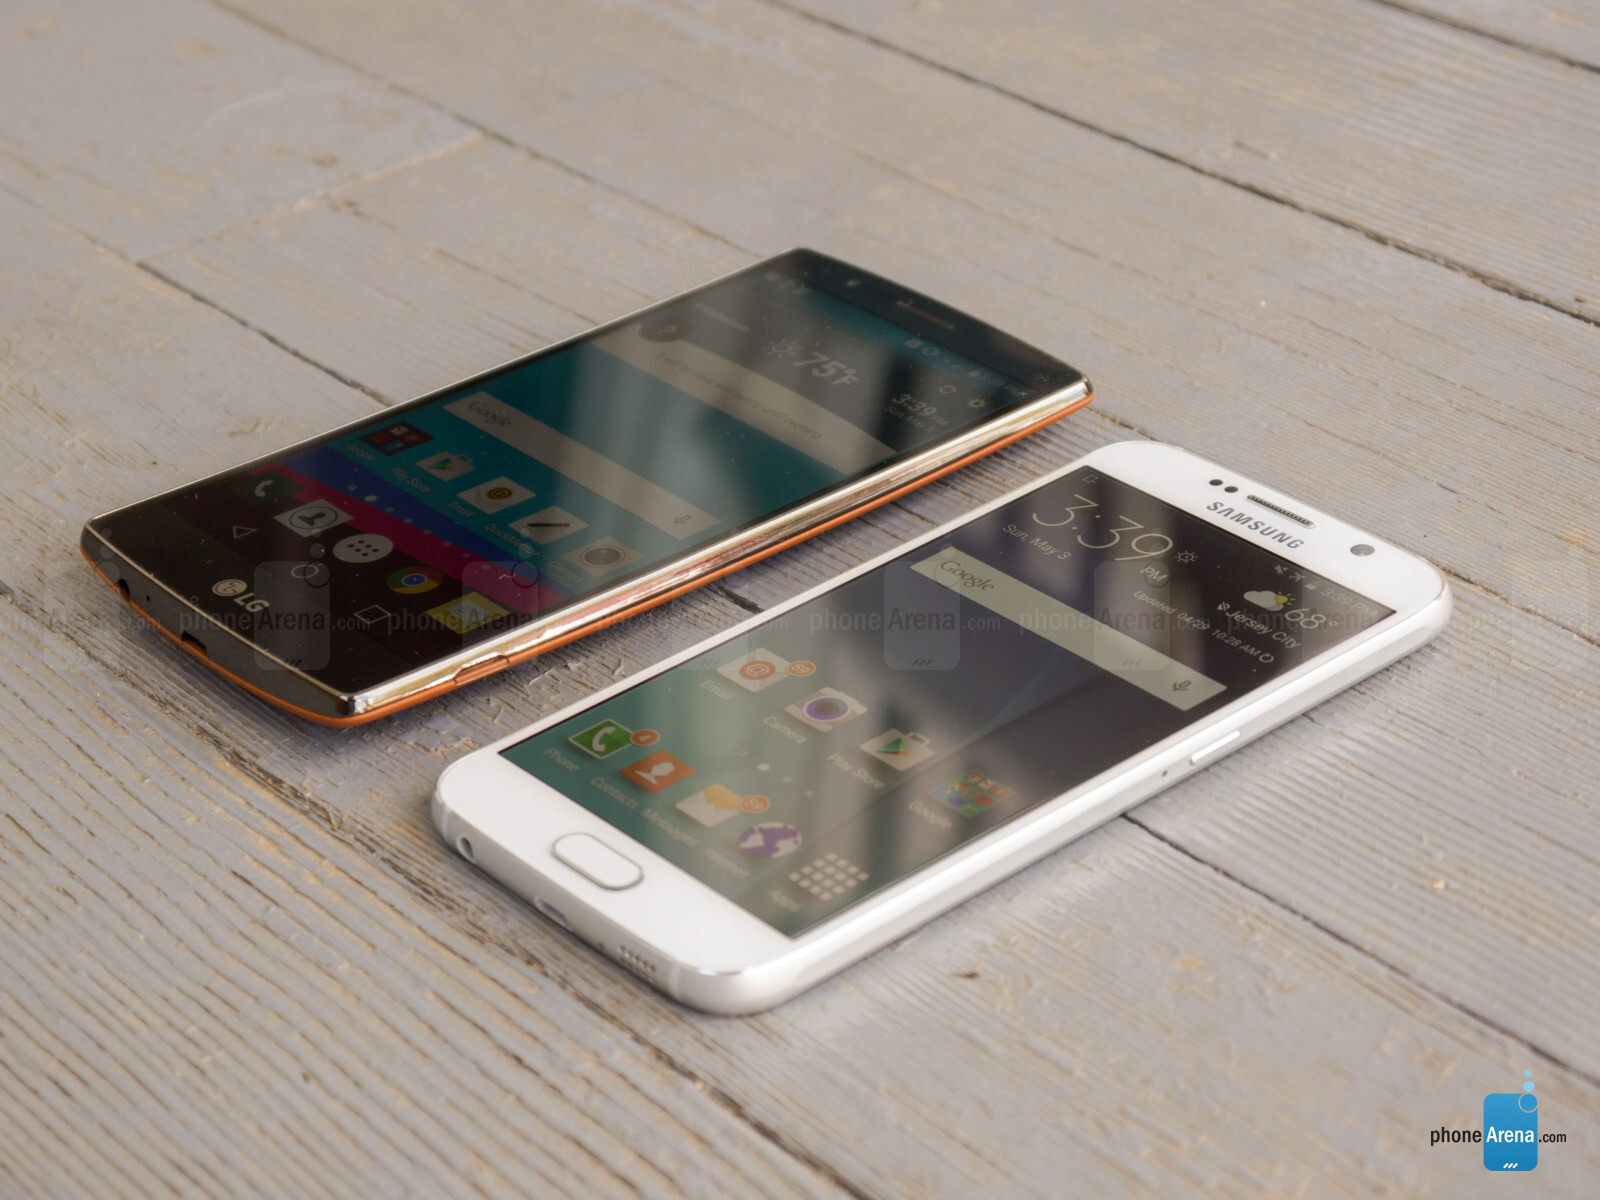 Lg G4 Vs Galaxy S7 Edge: LG G4 Vs Samsung Galaxy S6